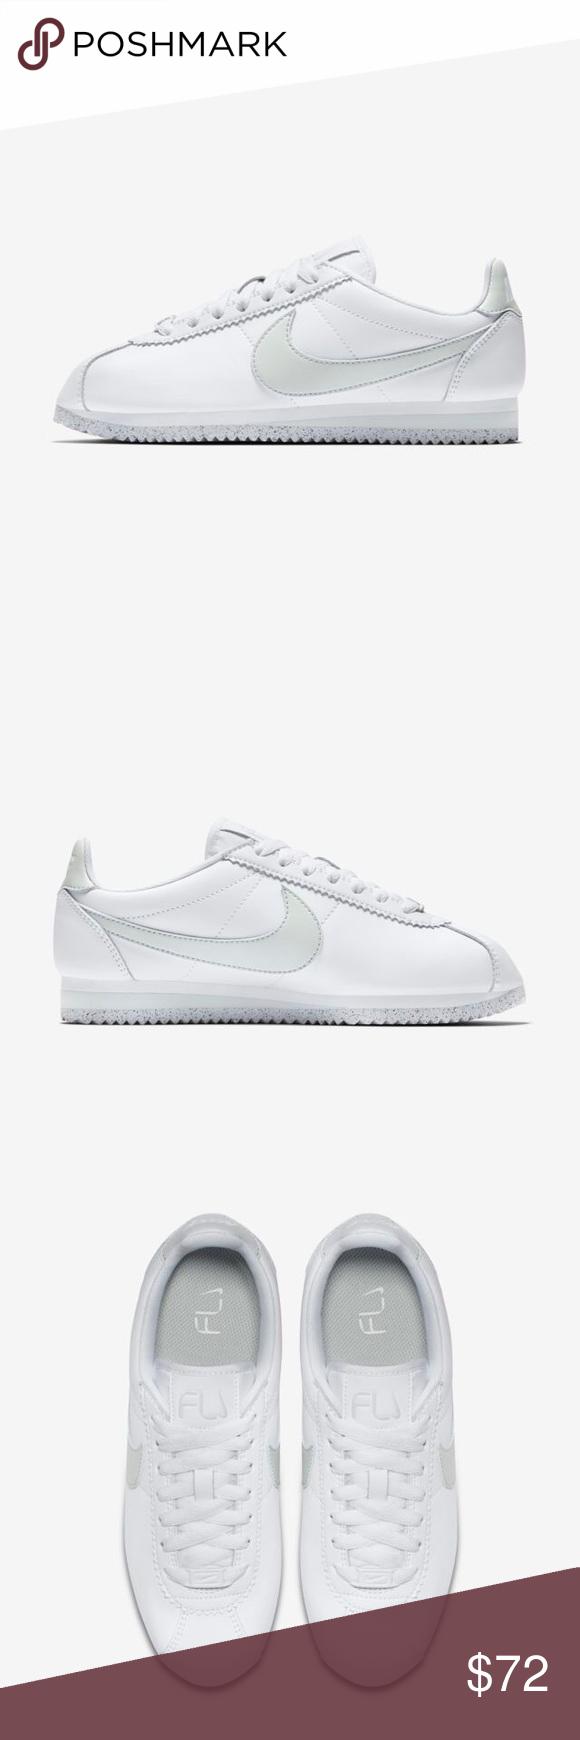 c924992d58b2f NEW IN BOX Nike Classic Cortez Flyleather Nike Classic Cortez Flyleather  Sneaker New in box. Never worn. Color  White White Light Silver Style   AR4874-100 ...